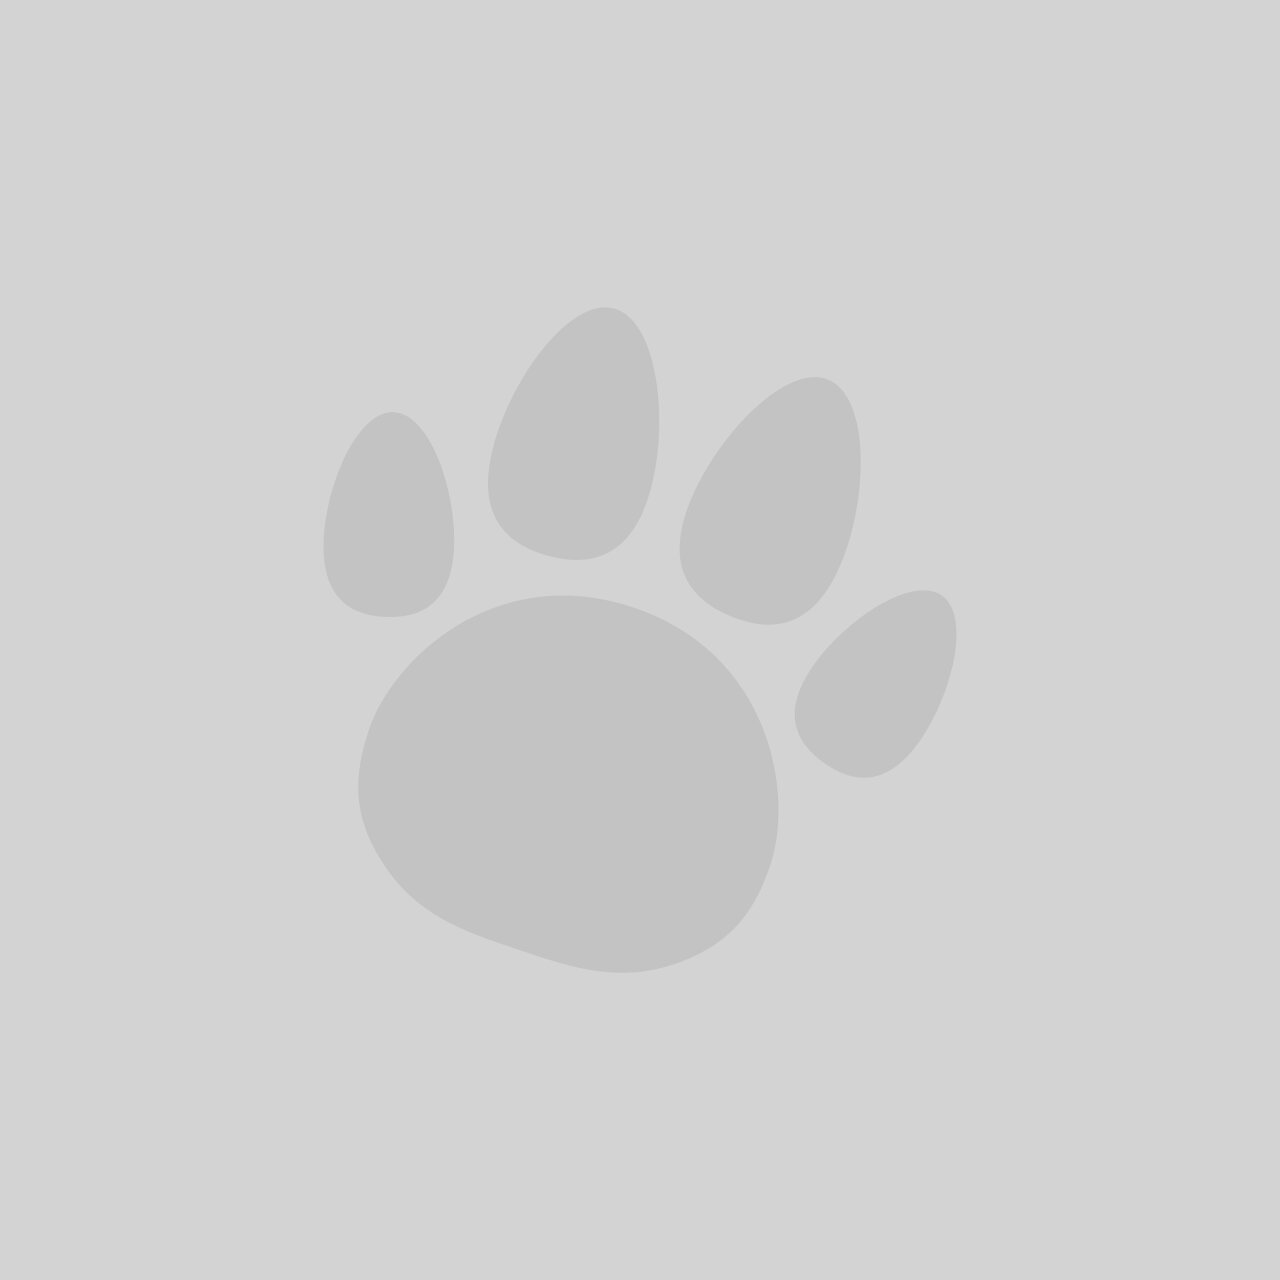 Flexi Neon Giant Retractable Cord Dog Lead 8m - Black Medium